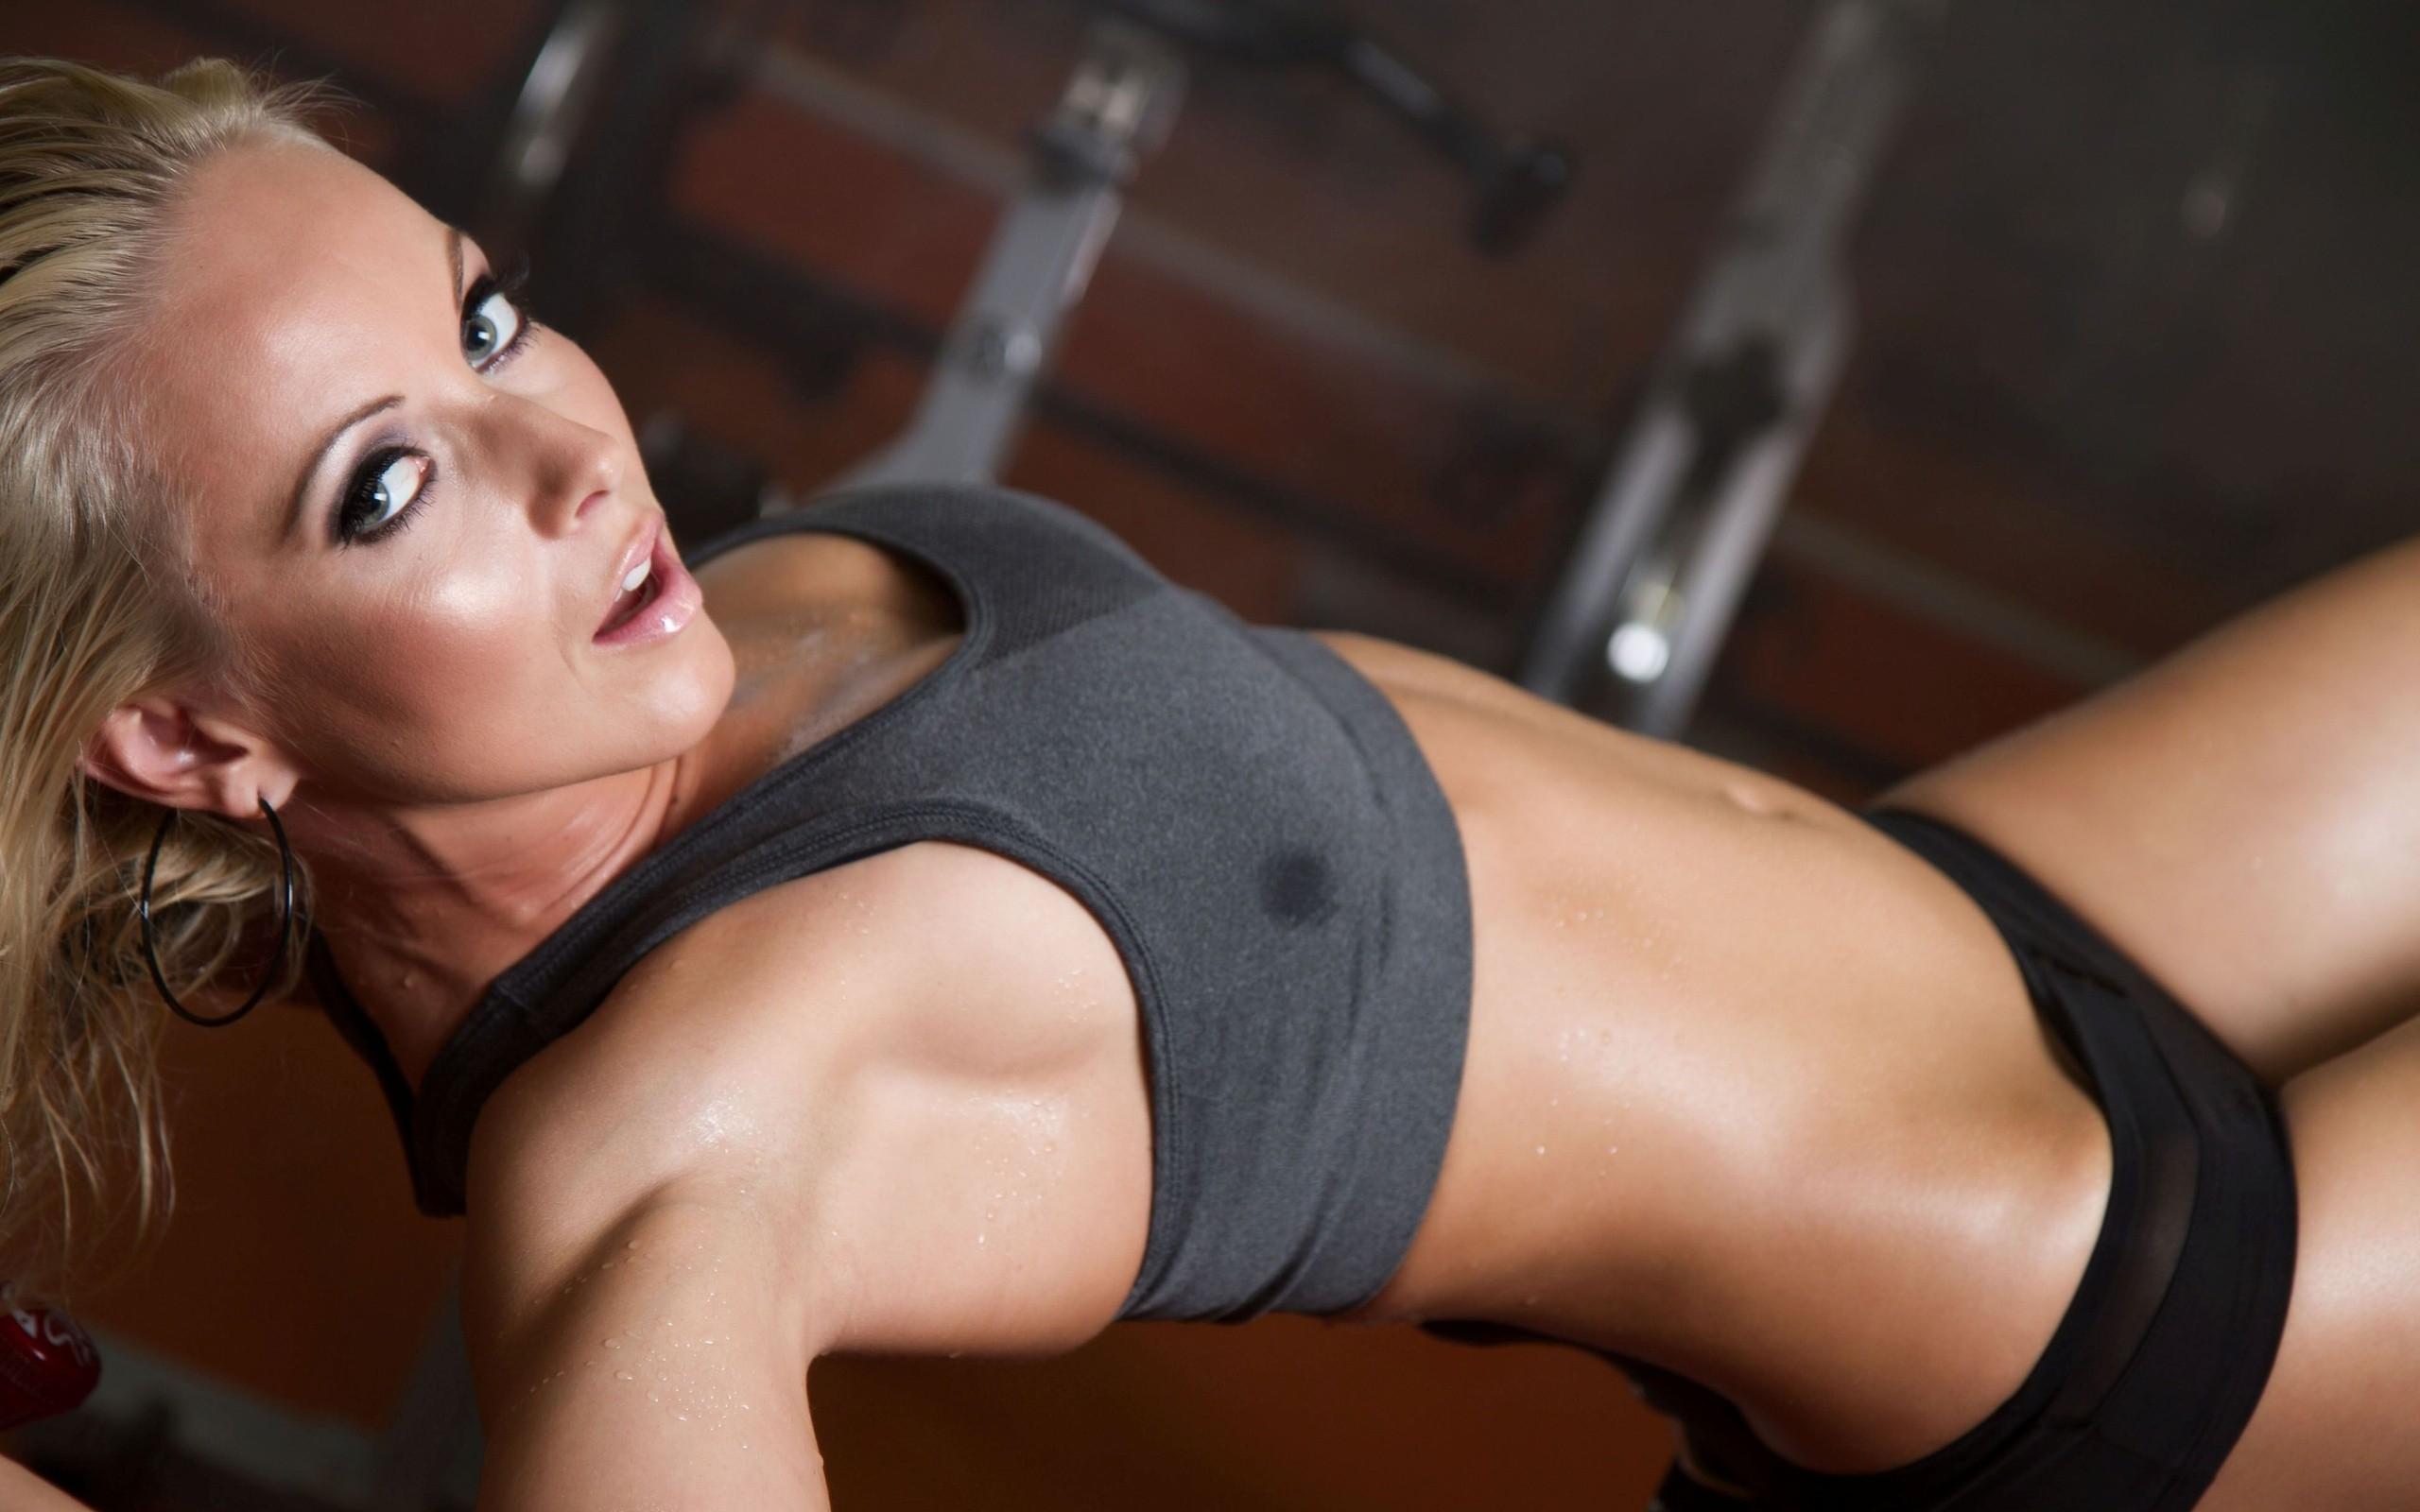 Women Model Mouth Clothing Jana Cova Leg Sense Muscle Chest Photo Shoot Abdomen Human Body Thigh